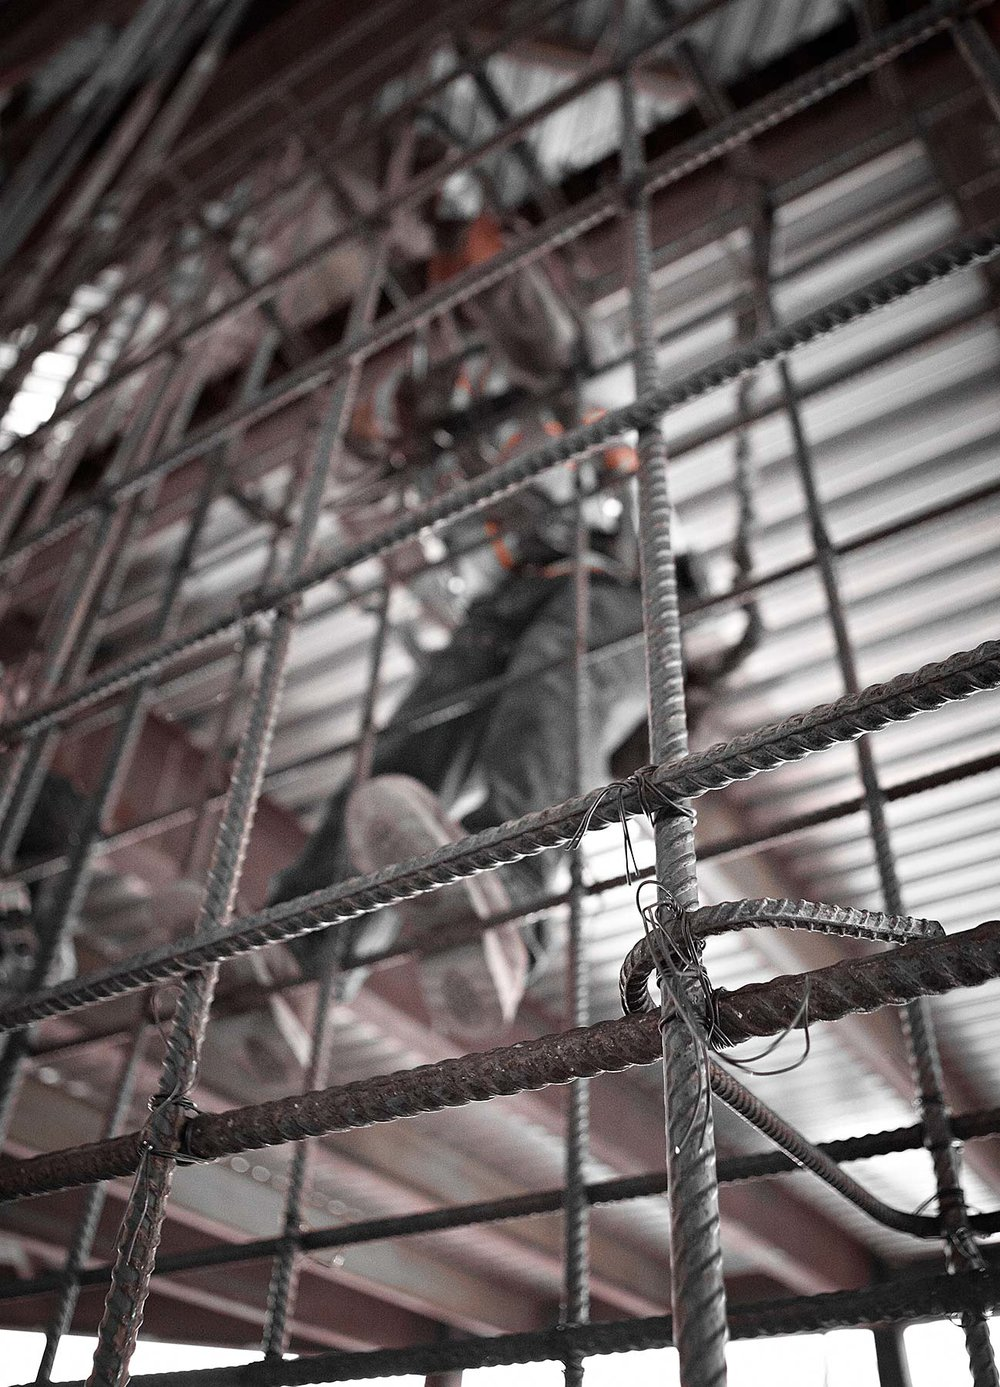 Jeremy-Frechette-OWTC-Construction-rebar.jpg